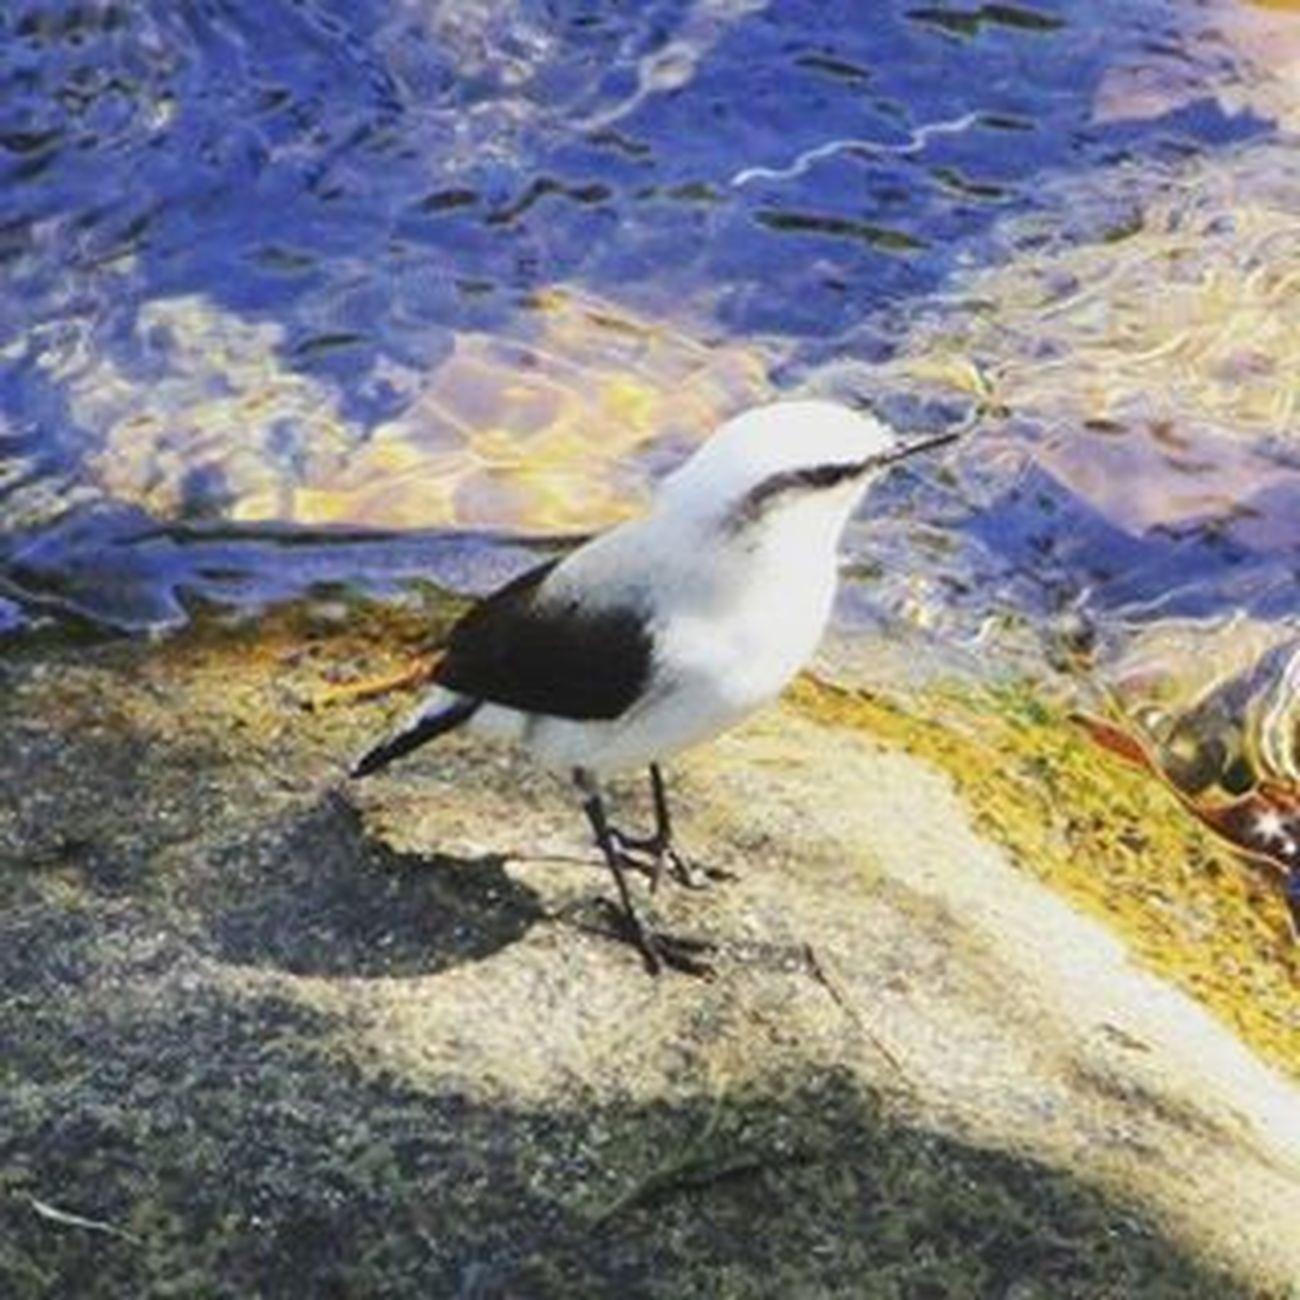 Bom dia! 🏞🐦🌞 Fotografando Porai Passaro Rio Riodejaneiro Cachoeira Orioelindodemais Amomuito Natureza Boasvibracoes Bomdia Buenosdias Goodmorning Love Nature MiHogar Meulugar MinhaCidade Guapimirim Caminhadamatinal